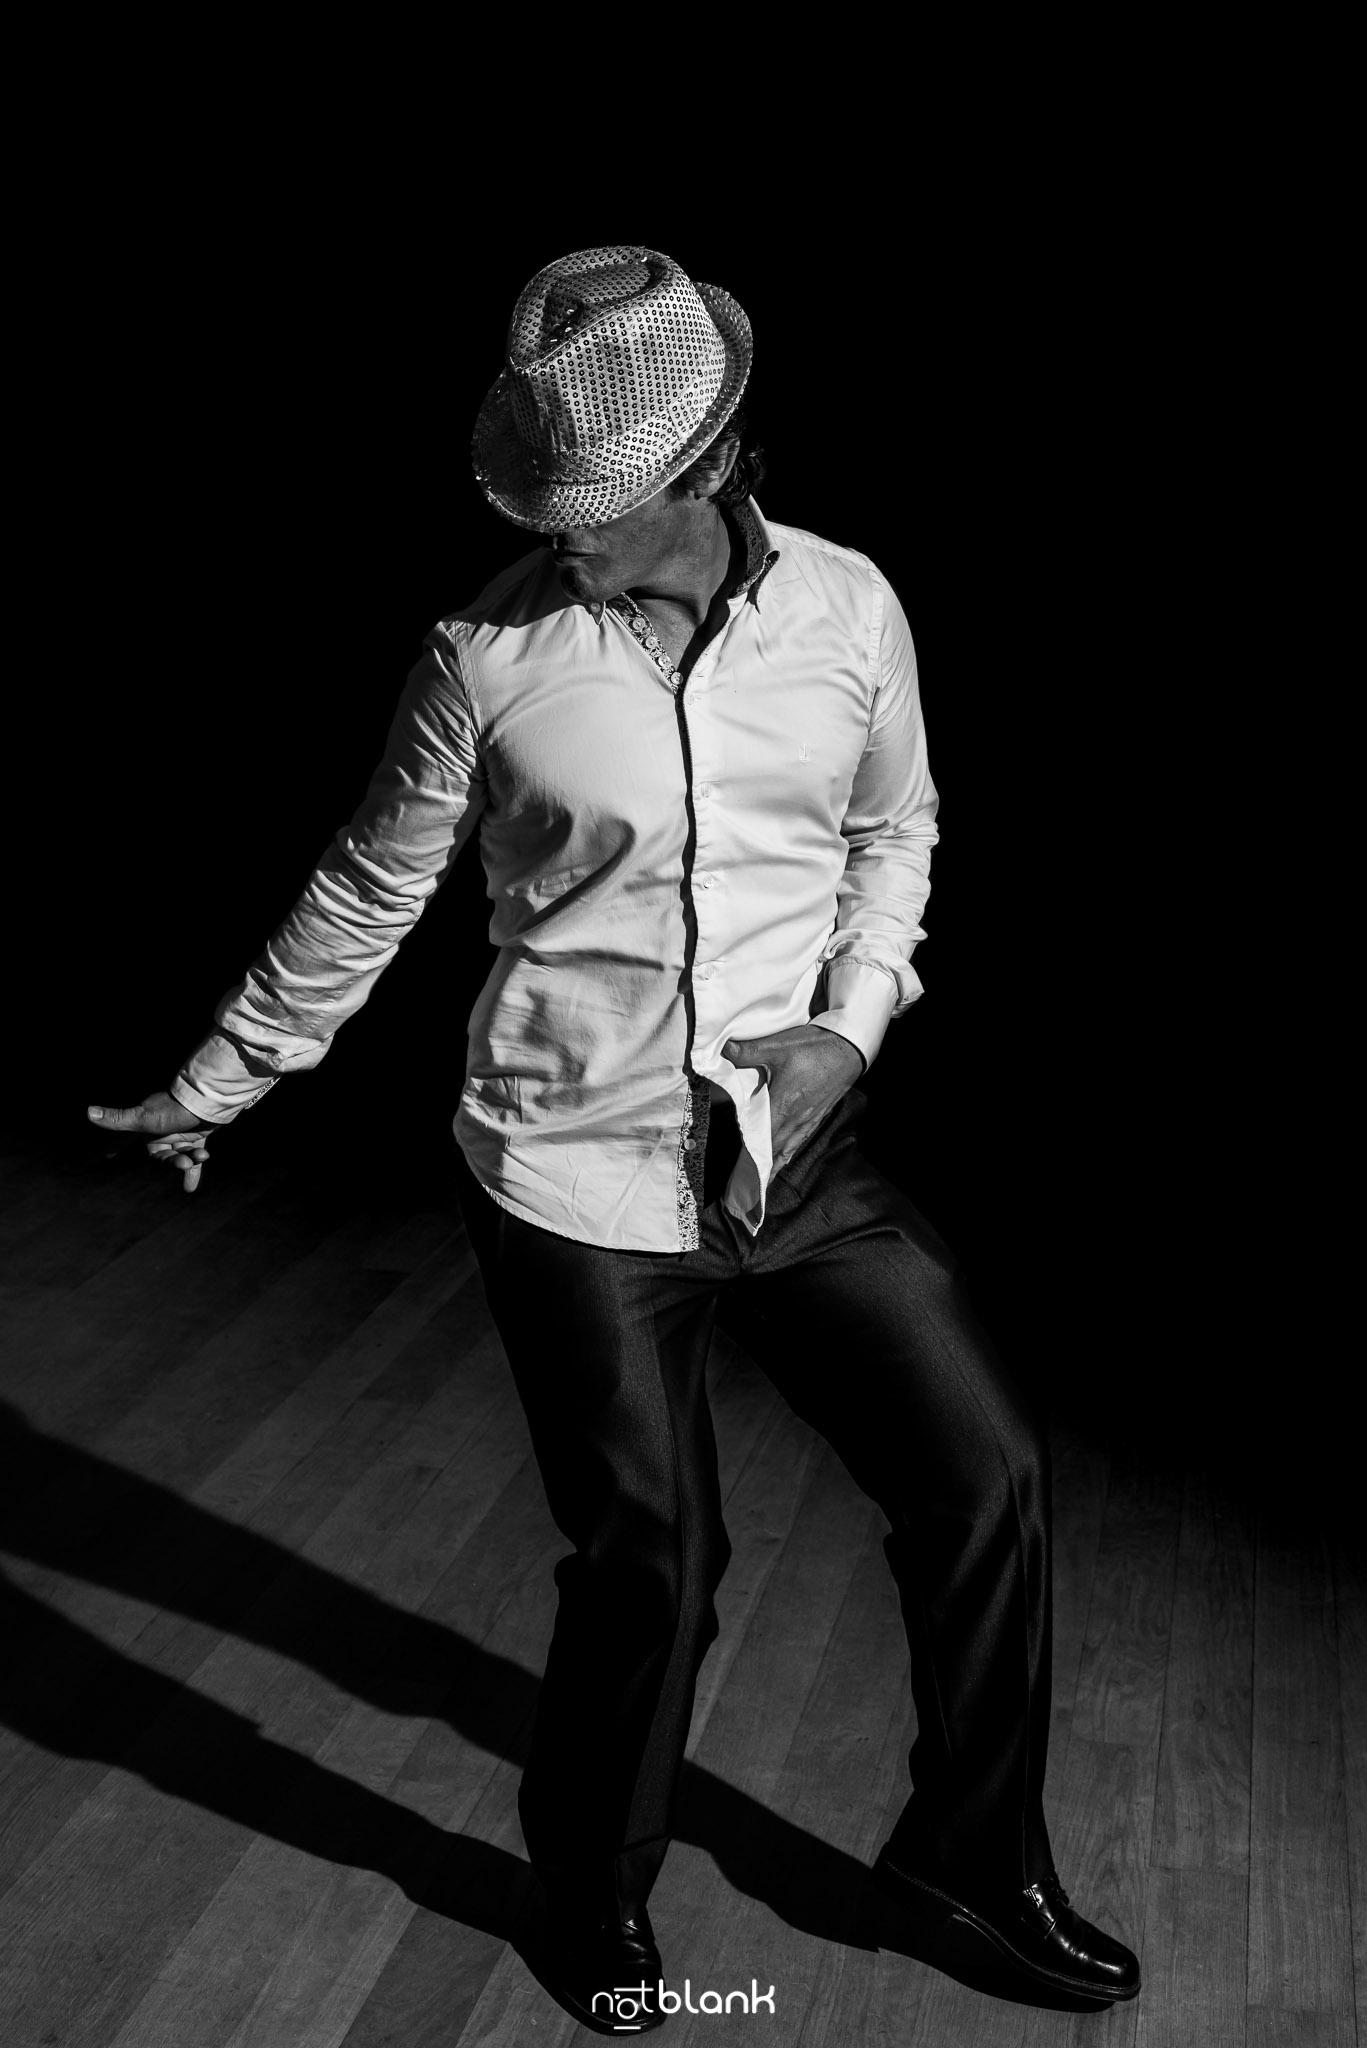 Notblank-Fiesta-Fotógrafo de boda-Amigo-Mondariz-Balneario-Baile-Michael Jackson-Moon Walking